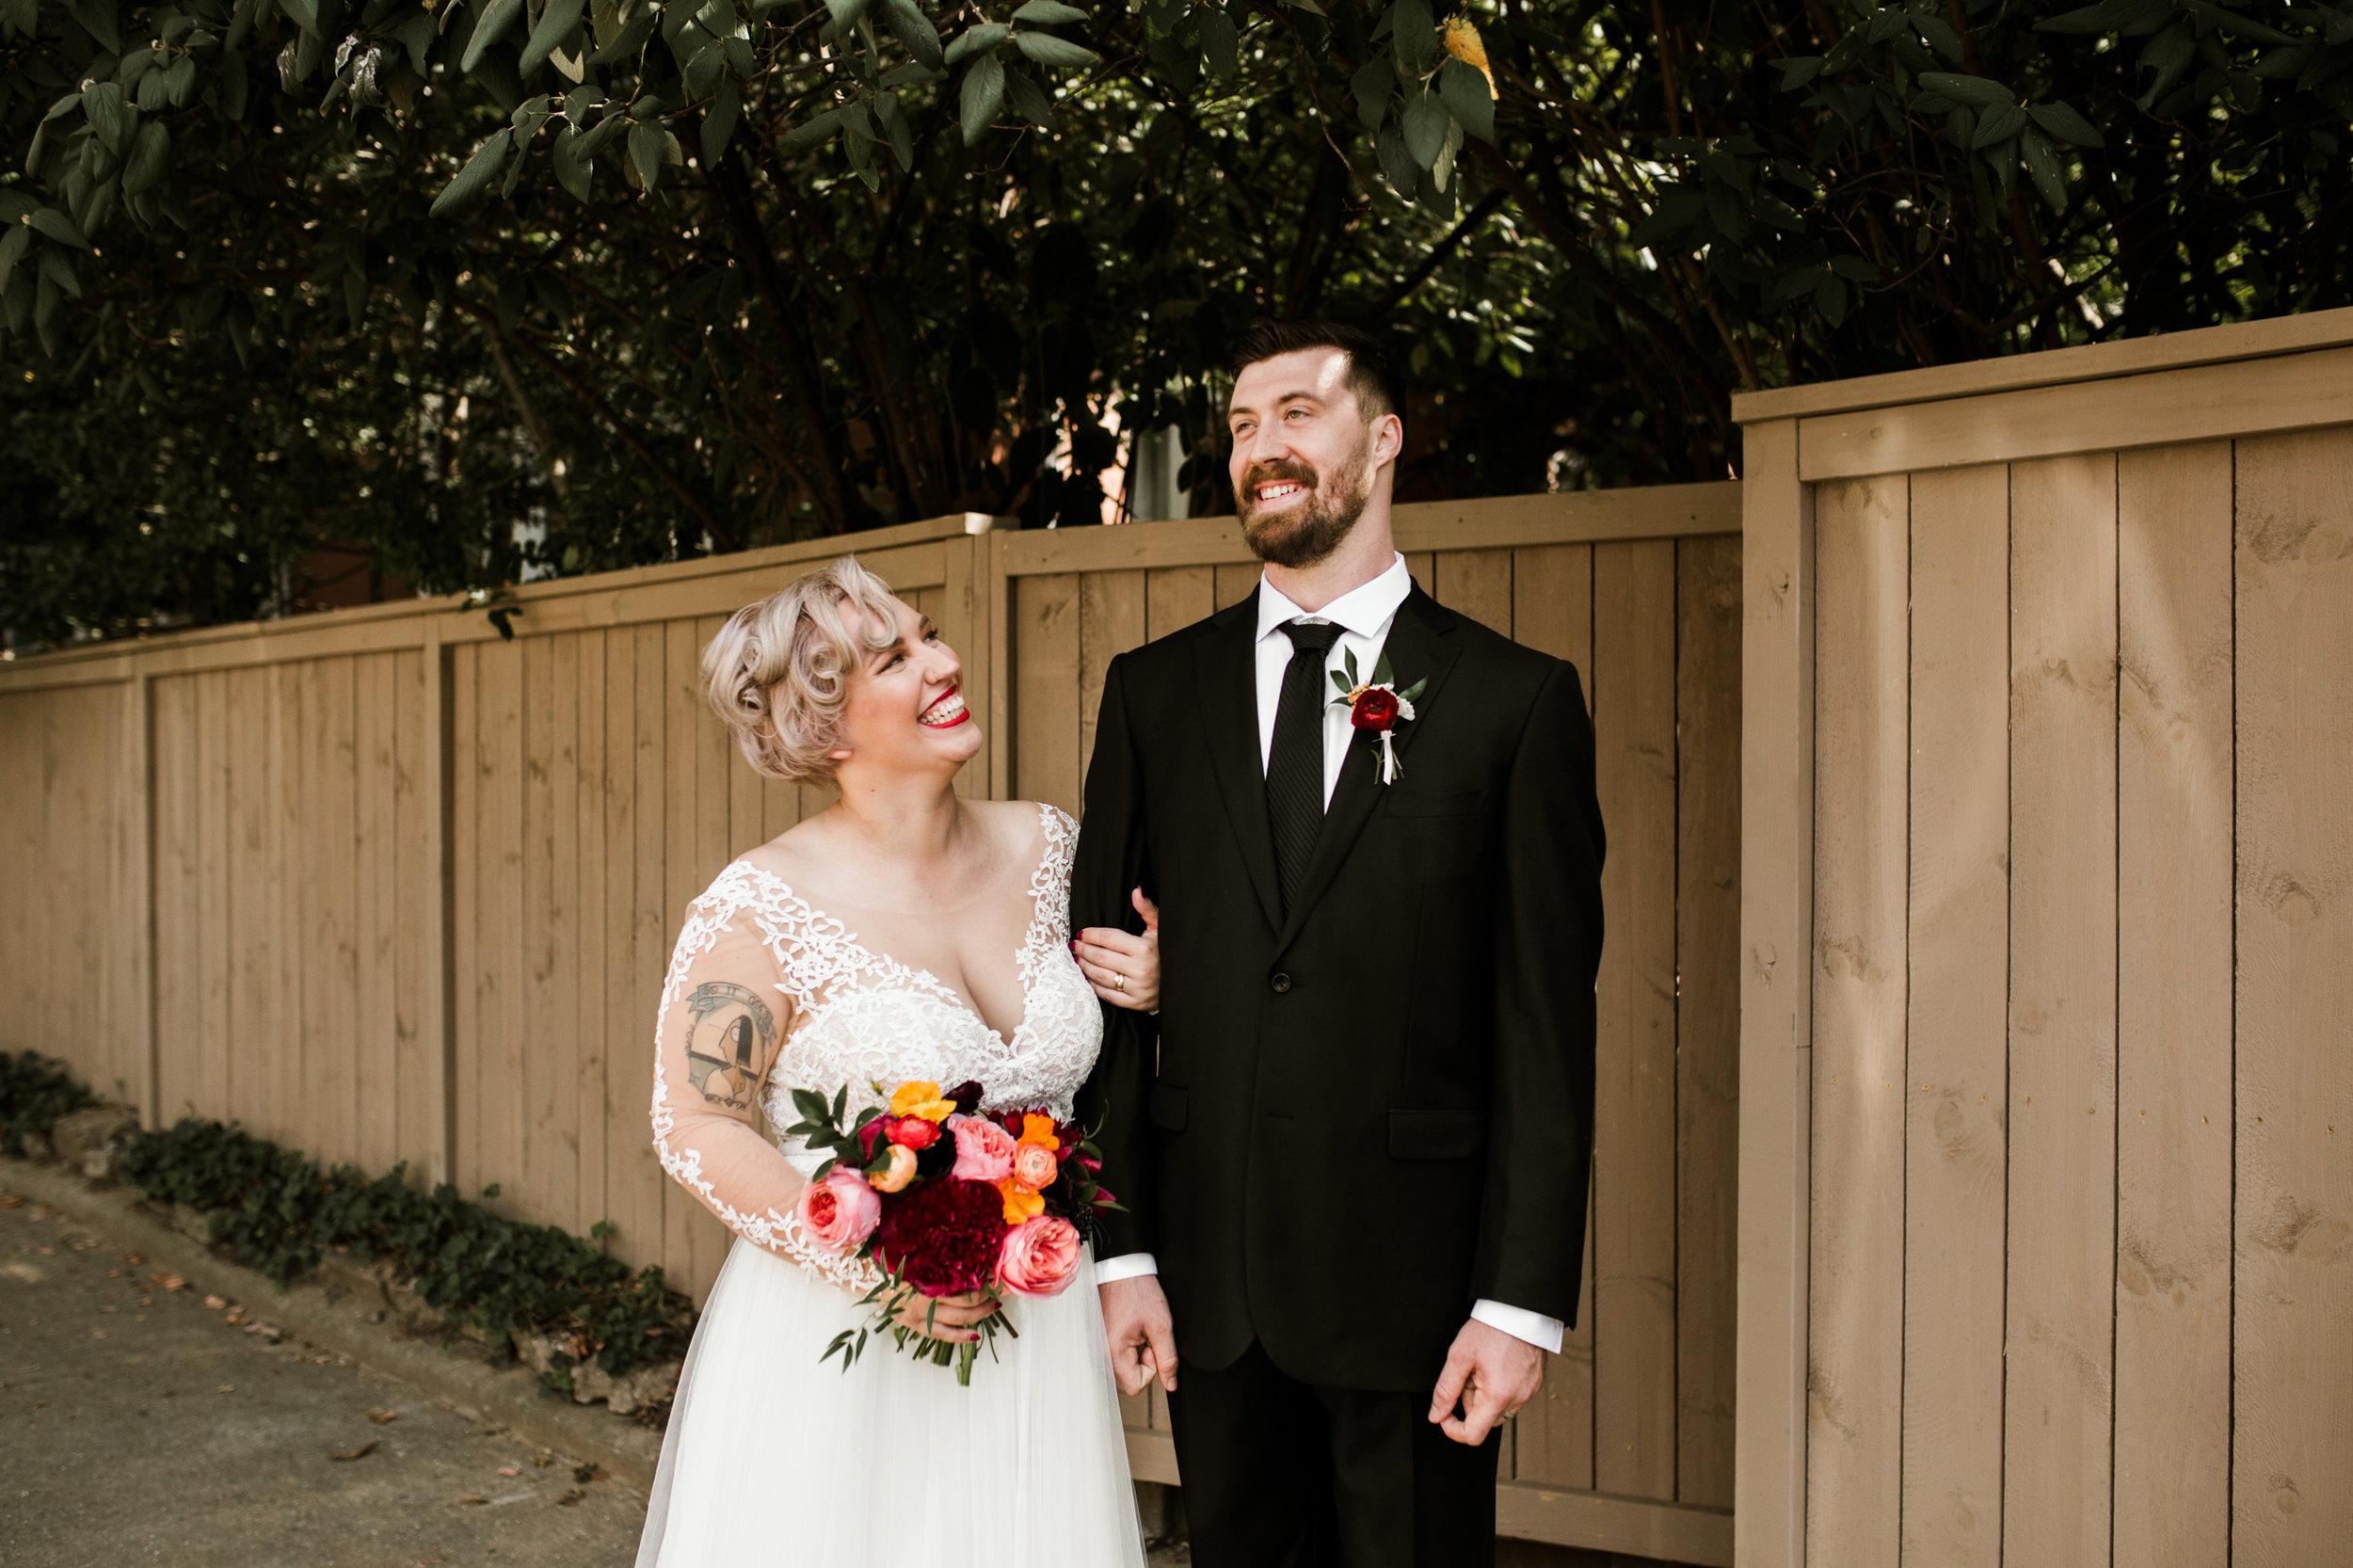 Kentucky Wedding Louisville Wedding Photographer 2018 Crystal Ludwick Photo Louisville Wedding Photographer Kentucky Wedding Photographer (102 of 105).jpg